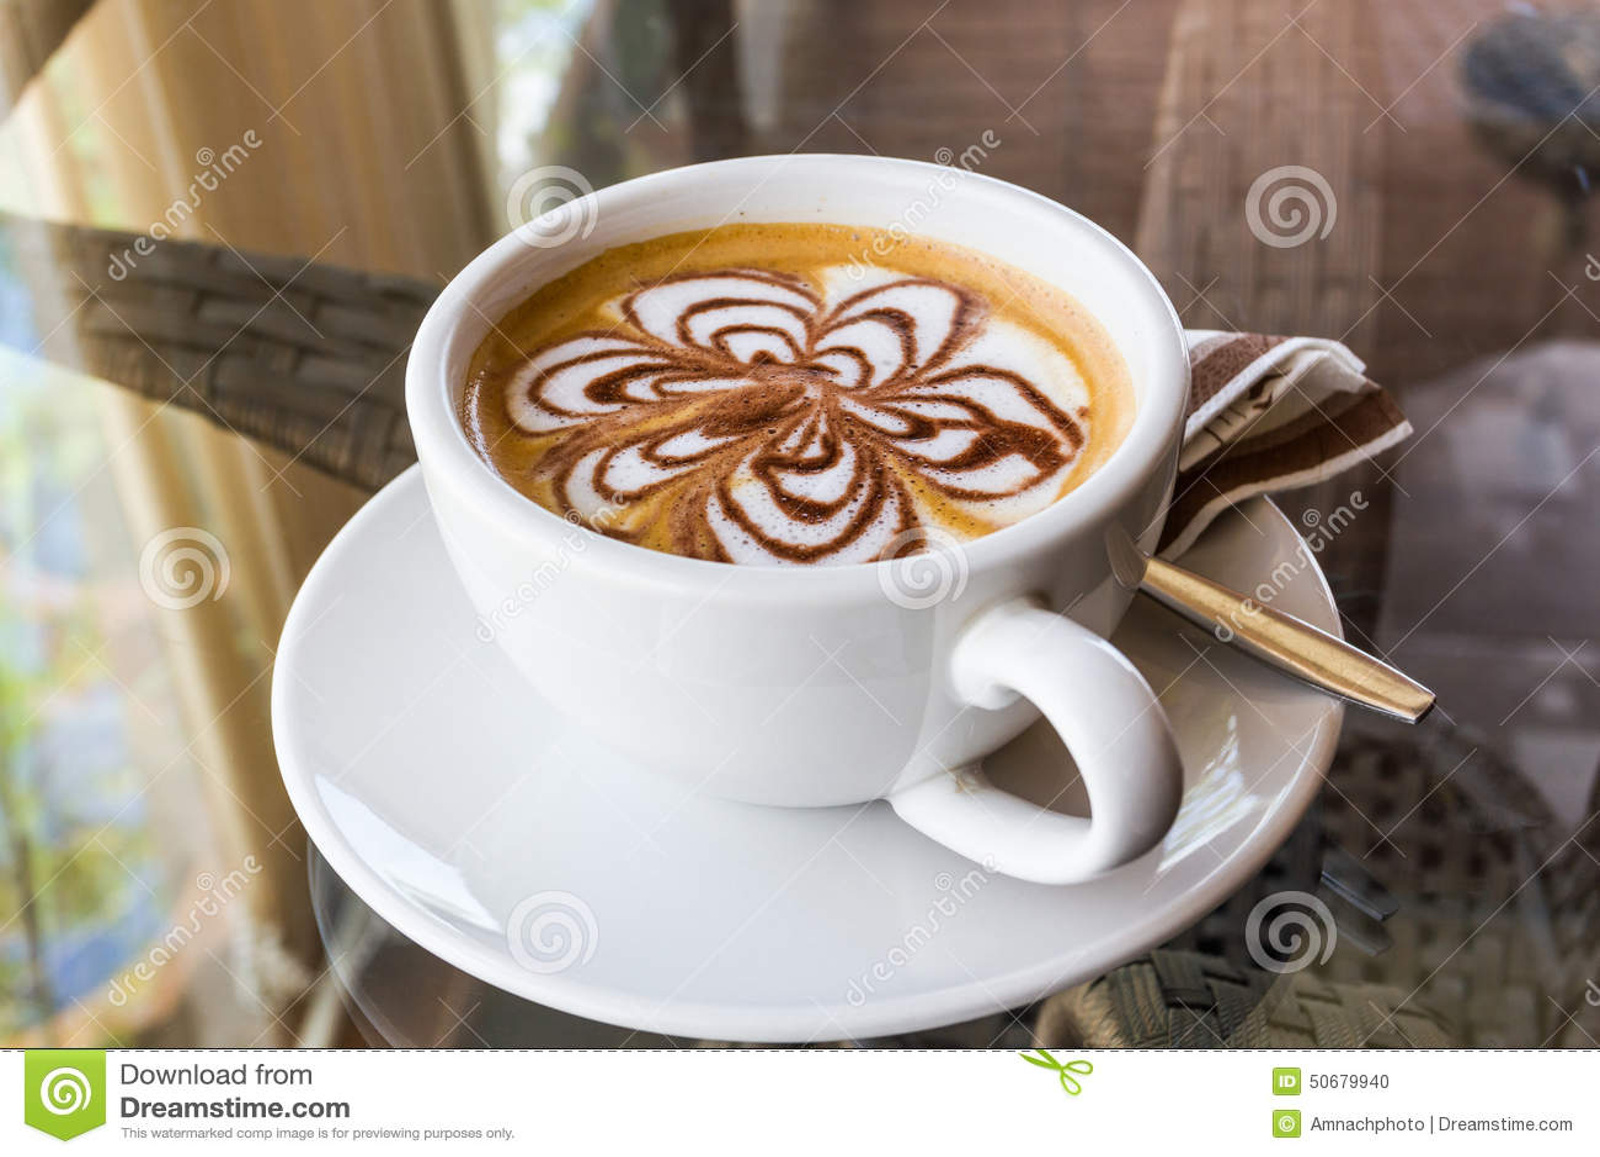 Download 热奶咖啡或latte咖啡 库存照片. 图片 包括有 饮料, 茶碟, 制动手, 可耕的, 自助餐厅, 咖啡因 - 50679940